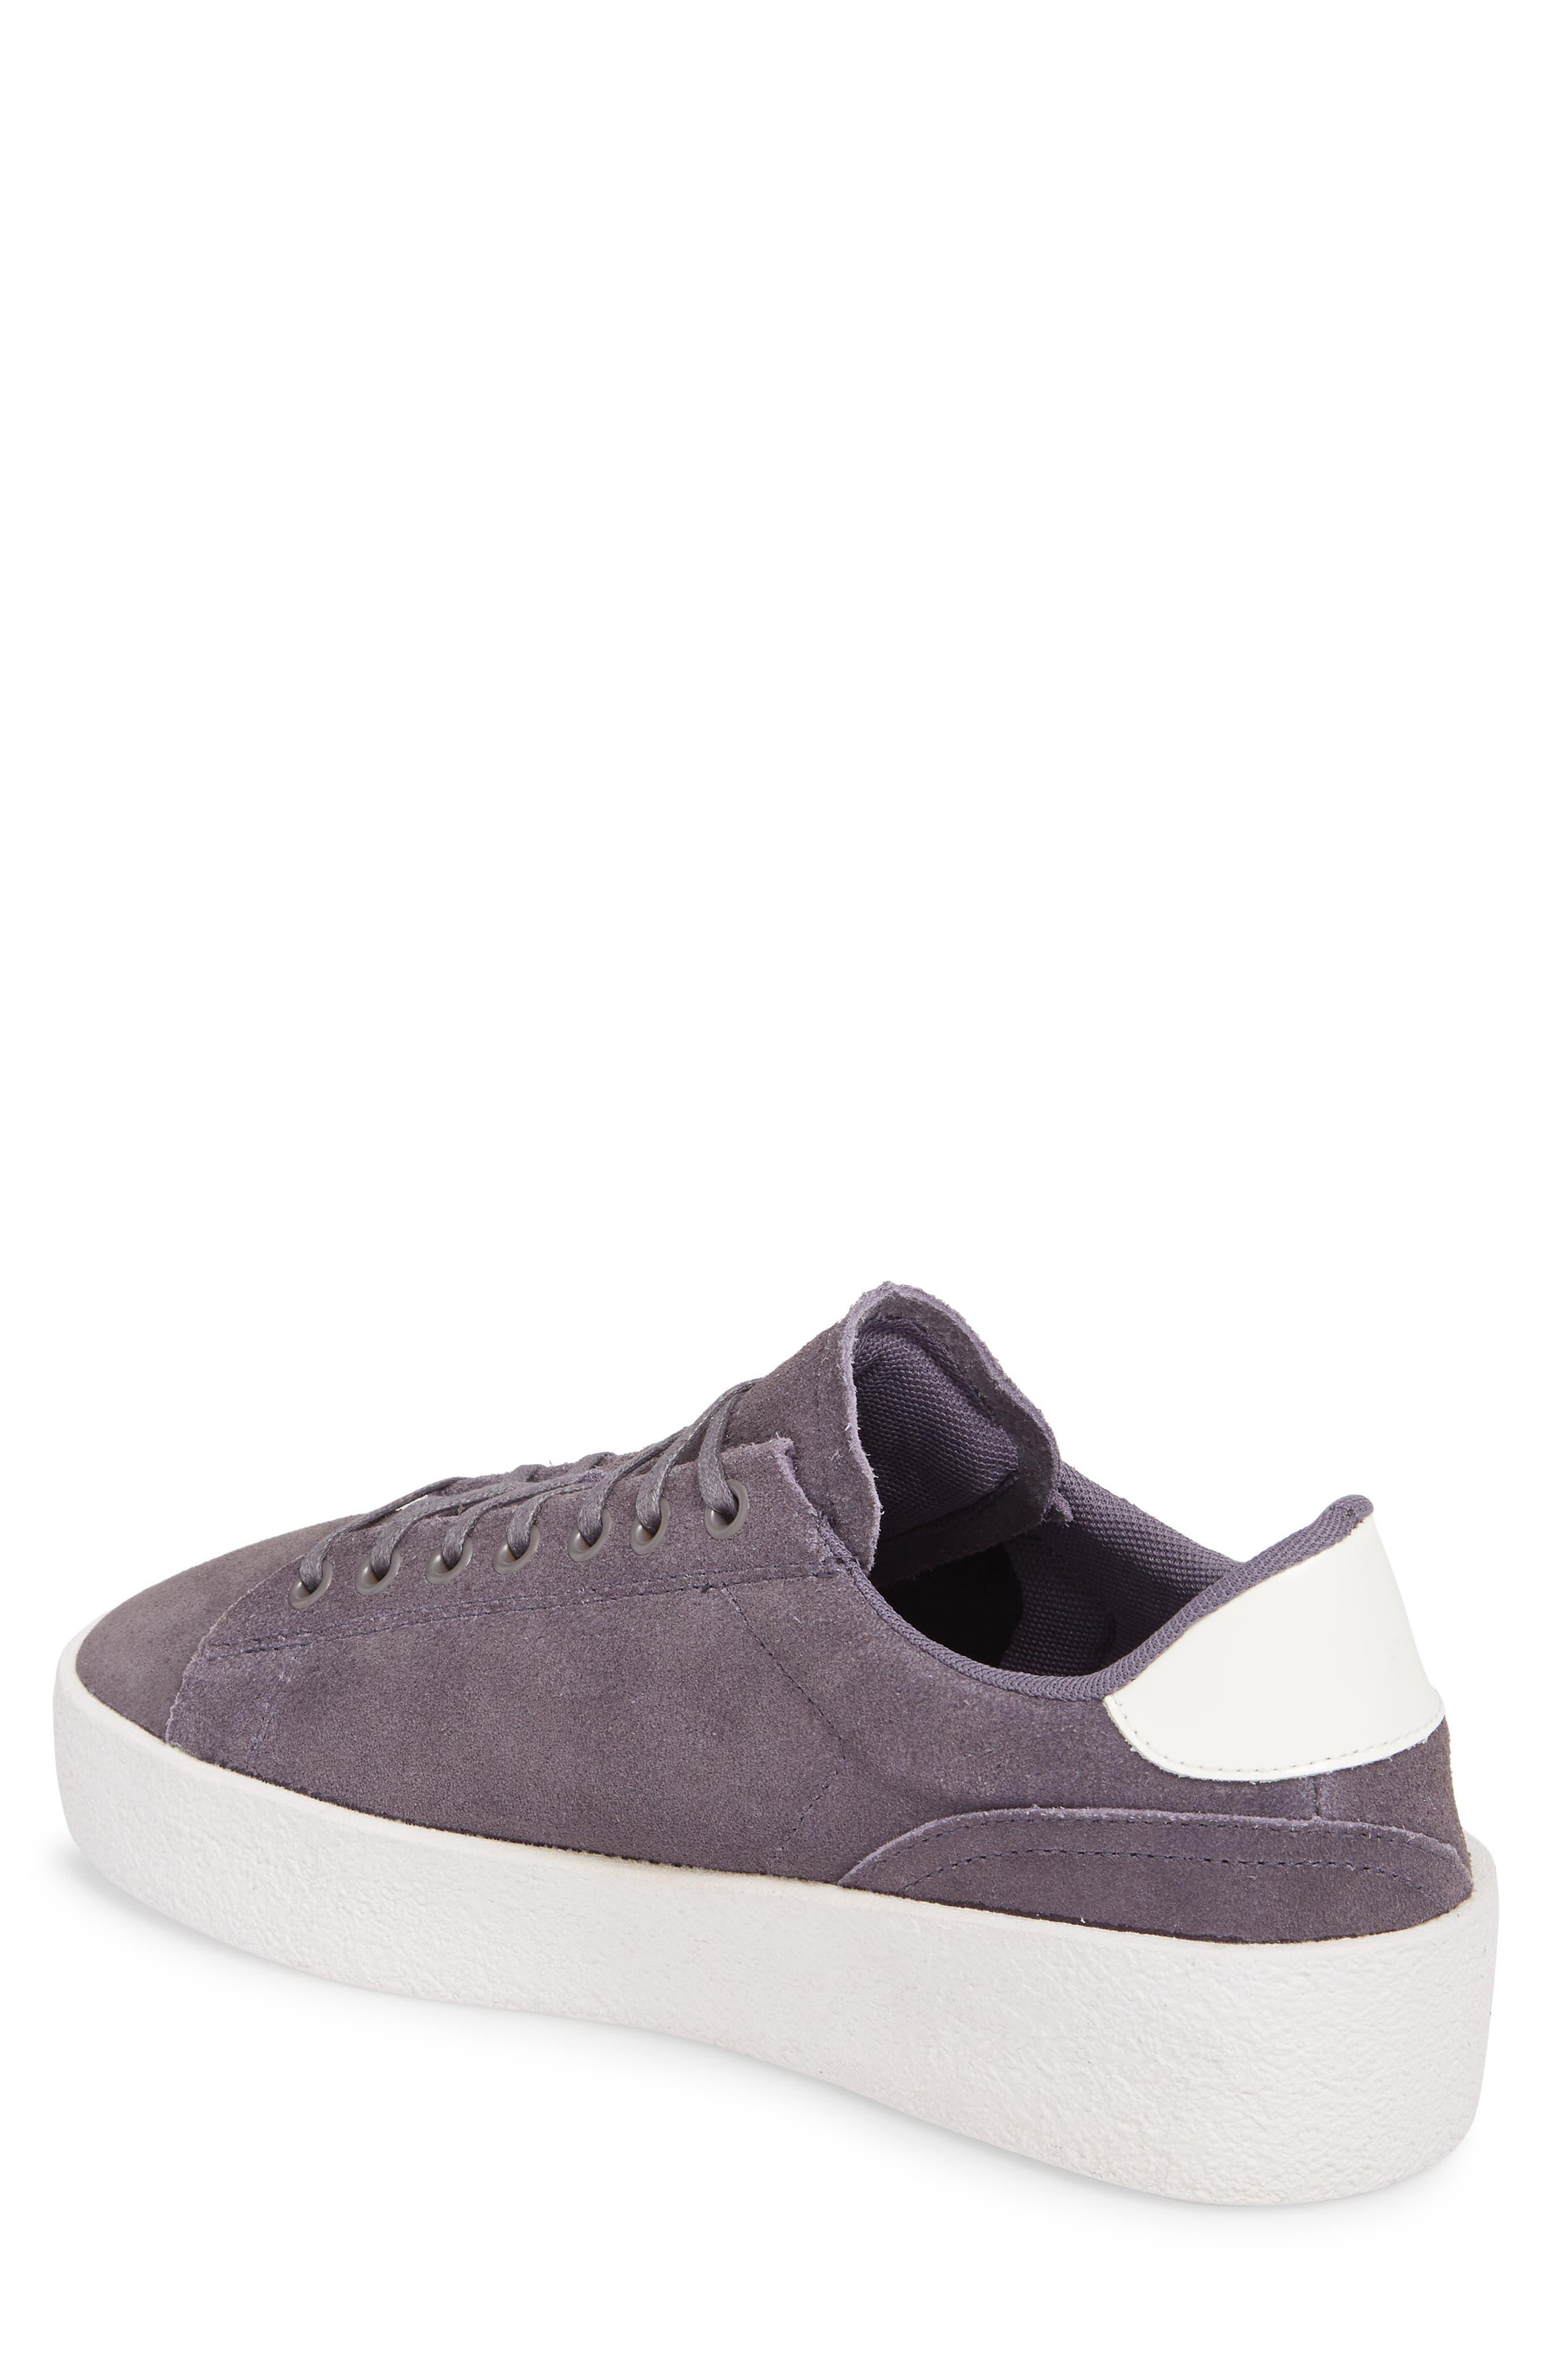 Jones Platform Sneaker,                             Alternate thumbnail 2, color,                             Purple Leather